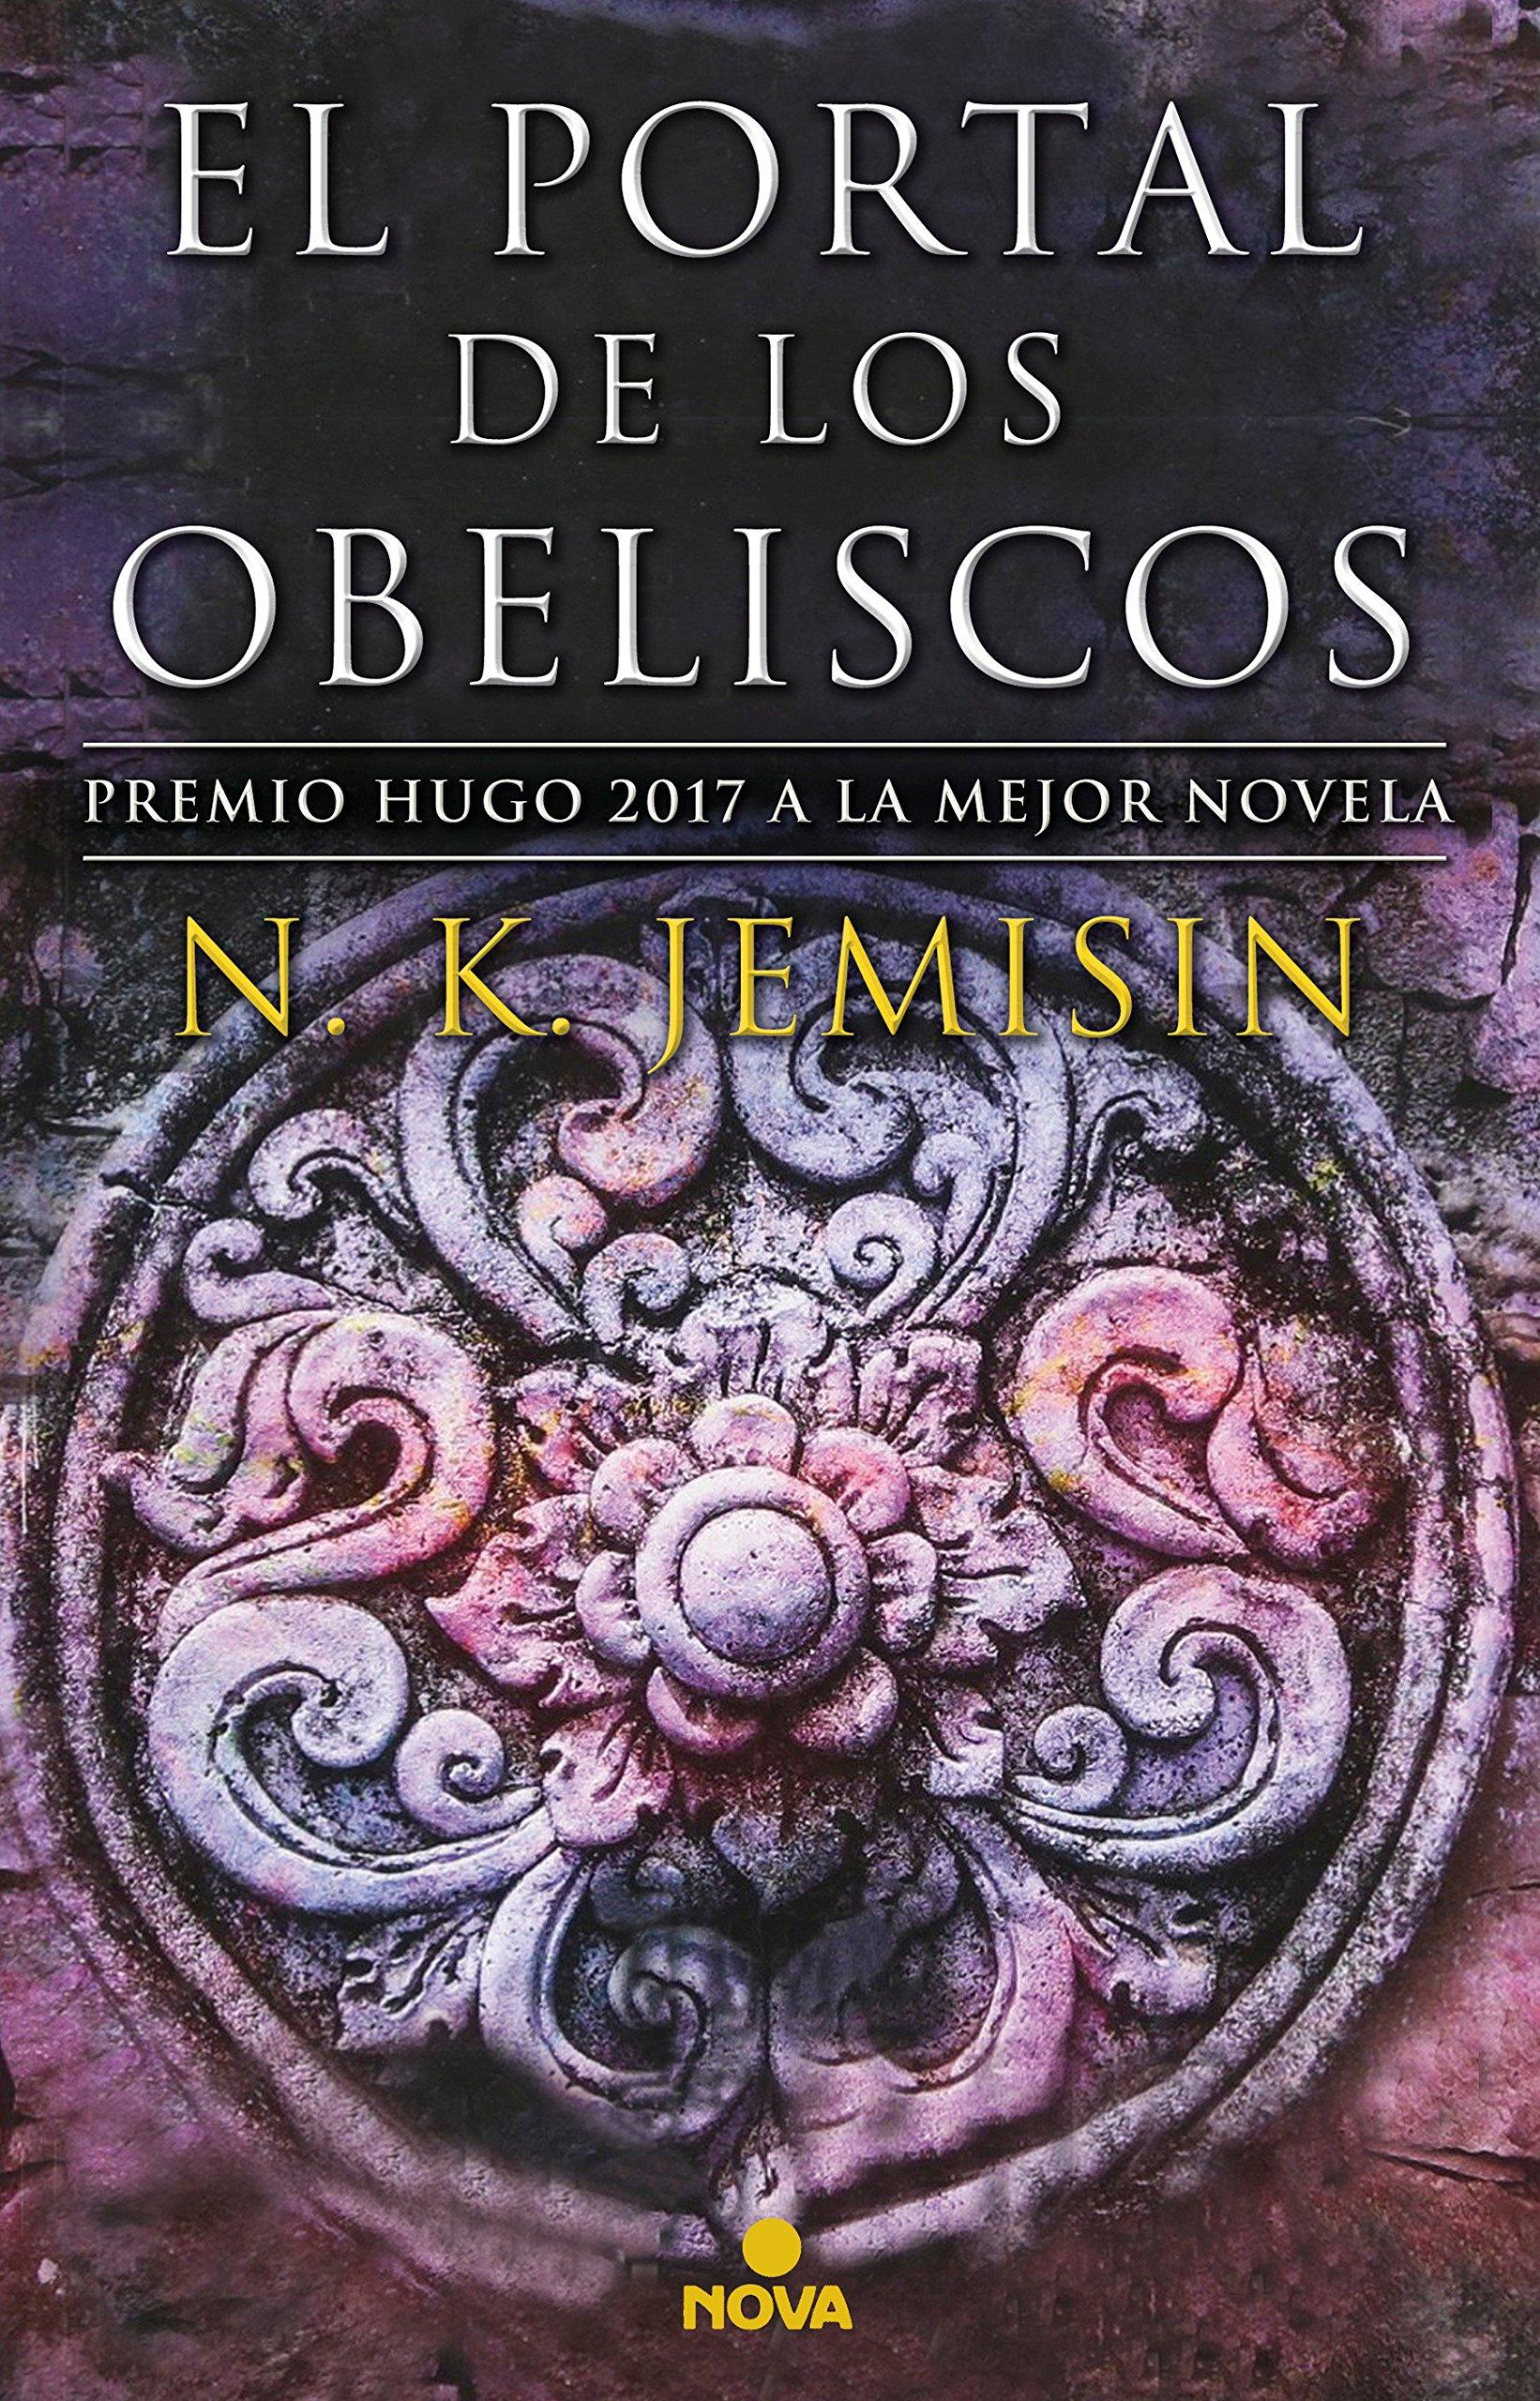 El portal de los obeliscos (La Tierra Fragmentada 2): Premio Hugo 2017 a la mejor novela (NOVA) Tapa blanda – 25 ene 2018 N.K. Jemisin 8466662677 Fantasy fiction. FICTION / Fantasy / Epic